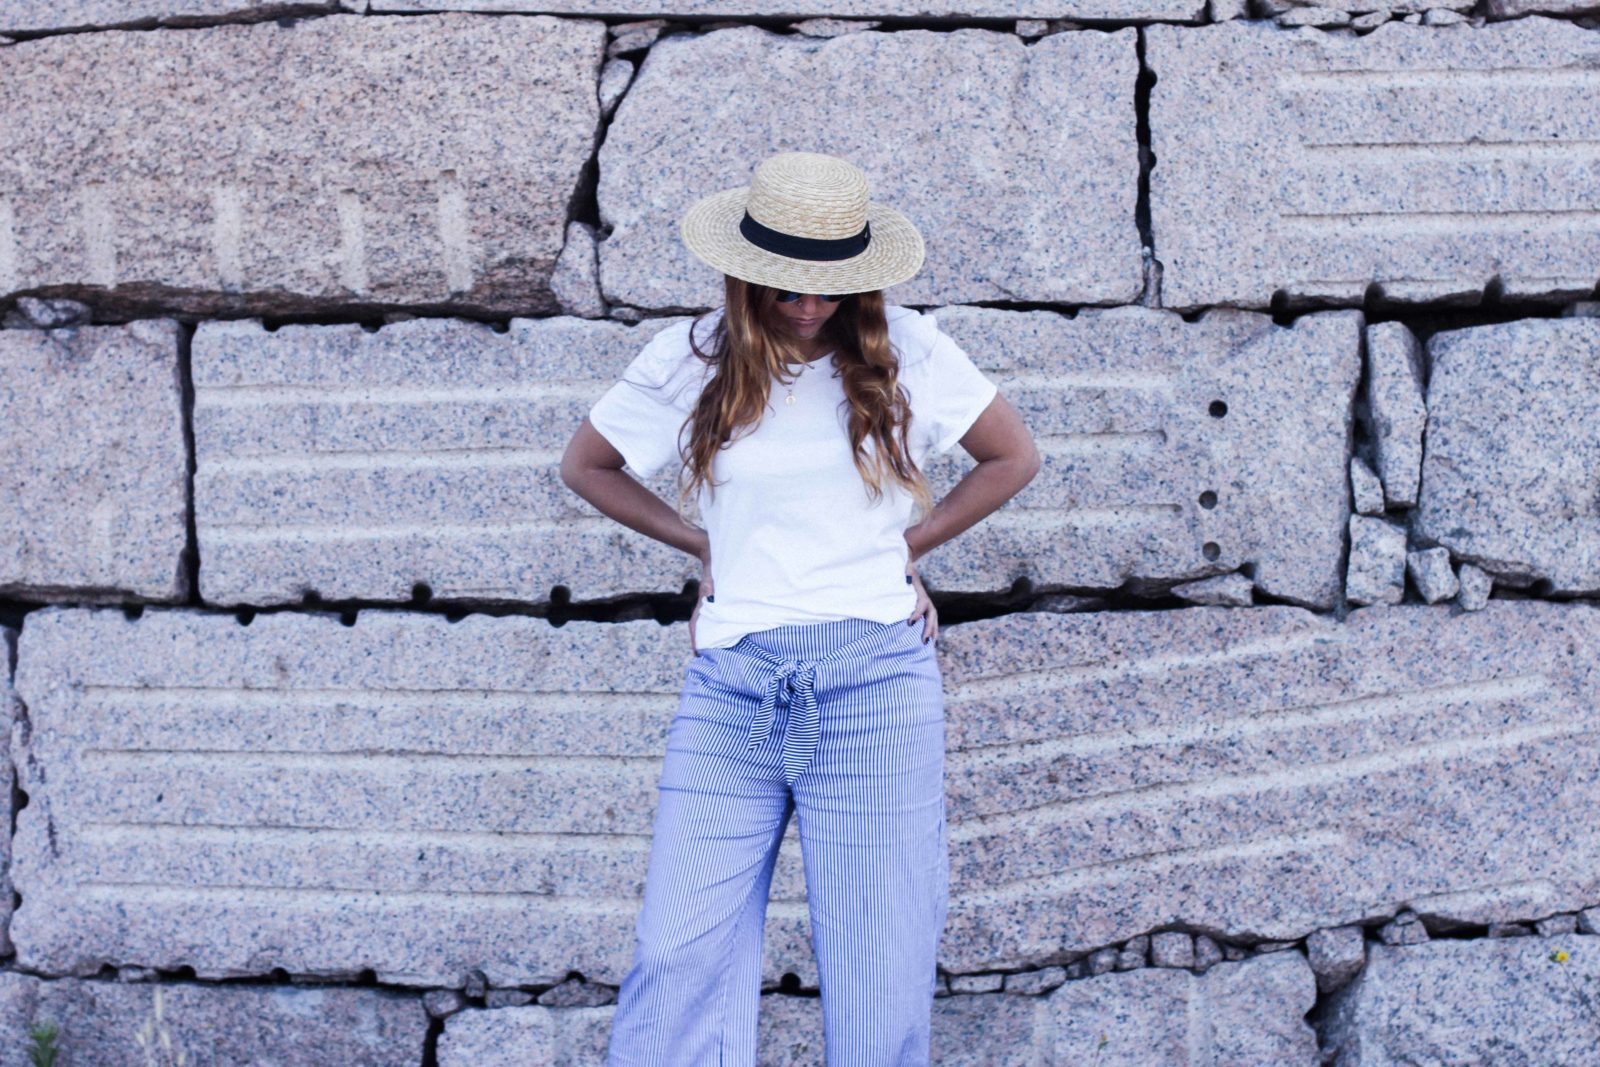 pantalones_con_lazo_colgante_herradura_donkeycool_ardentia_canotier-11